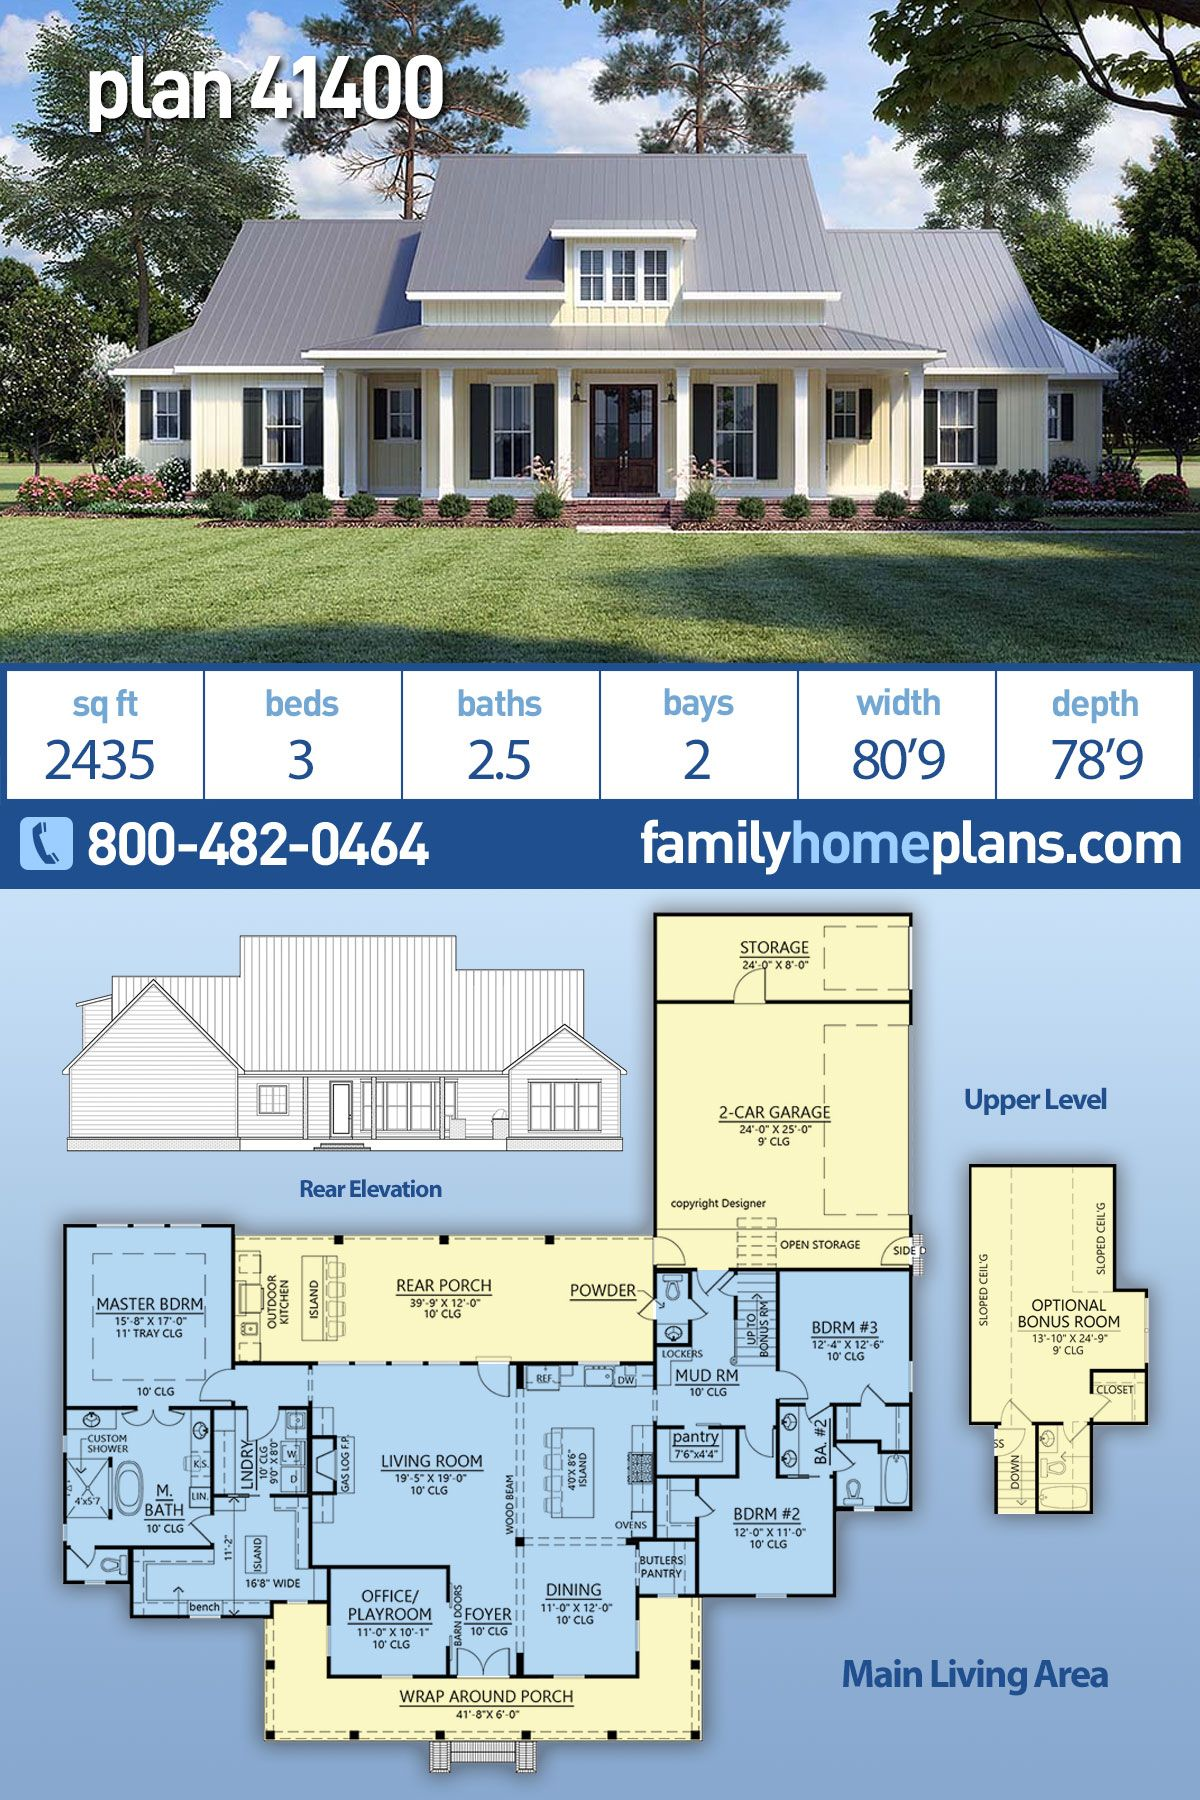 Traditional Style House Plan 41400 With 3 Bed 3 Bath 2 Car Garage Family House Plans Modern Farmhouse Plans Farmhouse Plans